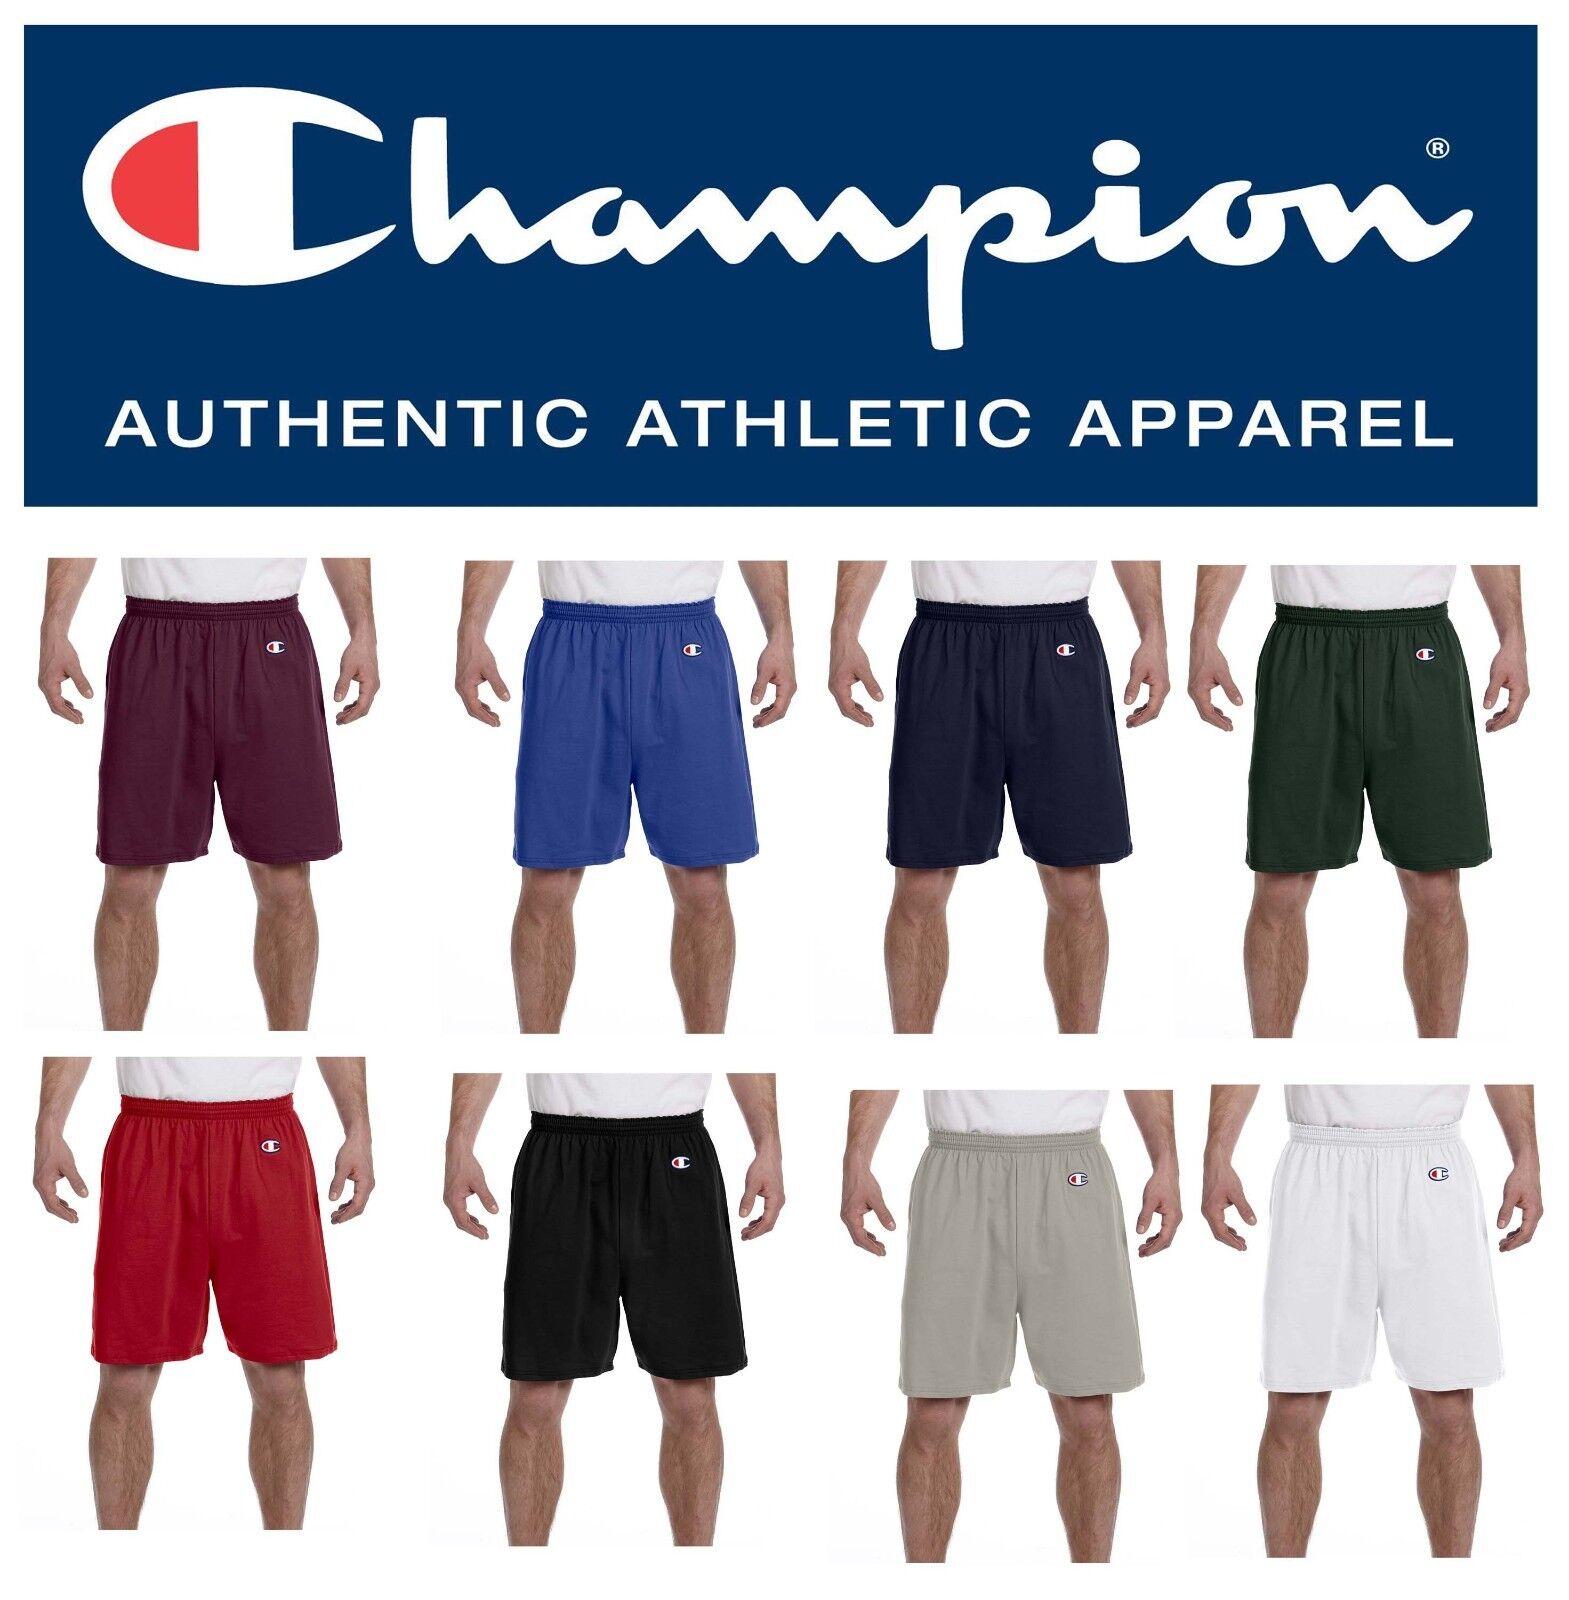 Champion Men/'s Shorts Cotton Athletic Gym Workout  6/'/' No Pocket 8187 S-XL 2X 3X